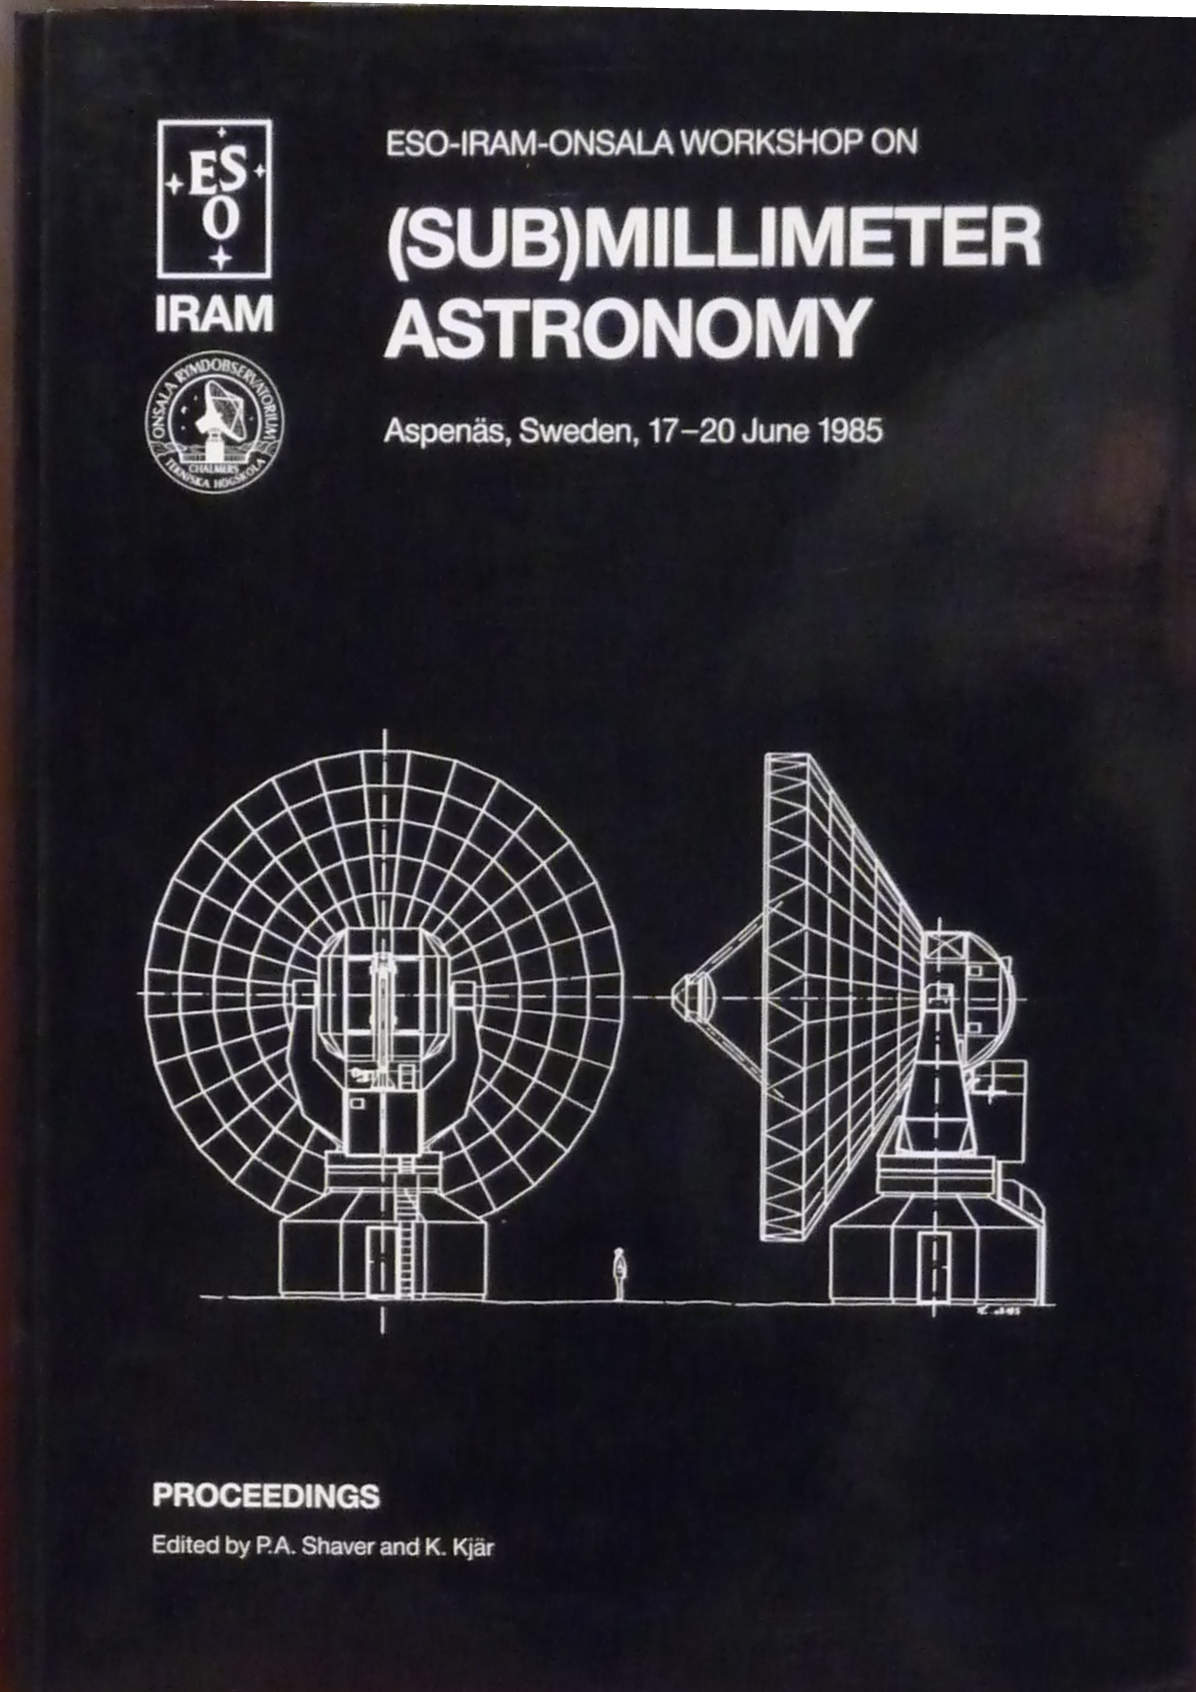 Eso-Iram-Onsala Workshop on (Sub)Millimeter Astronomy